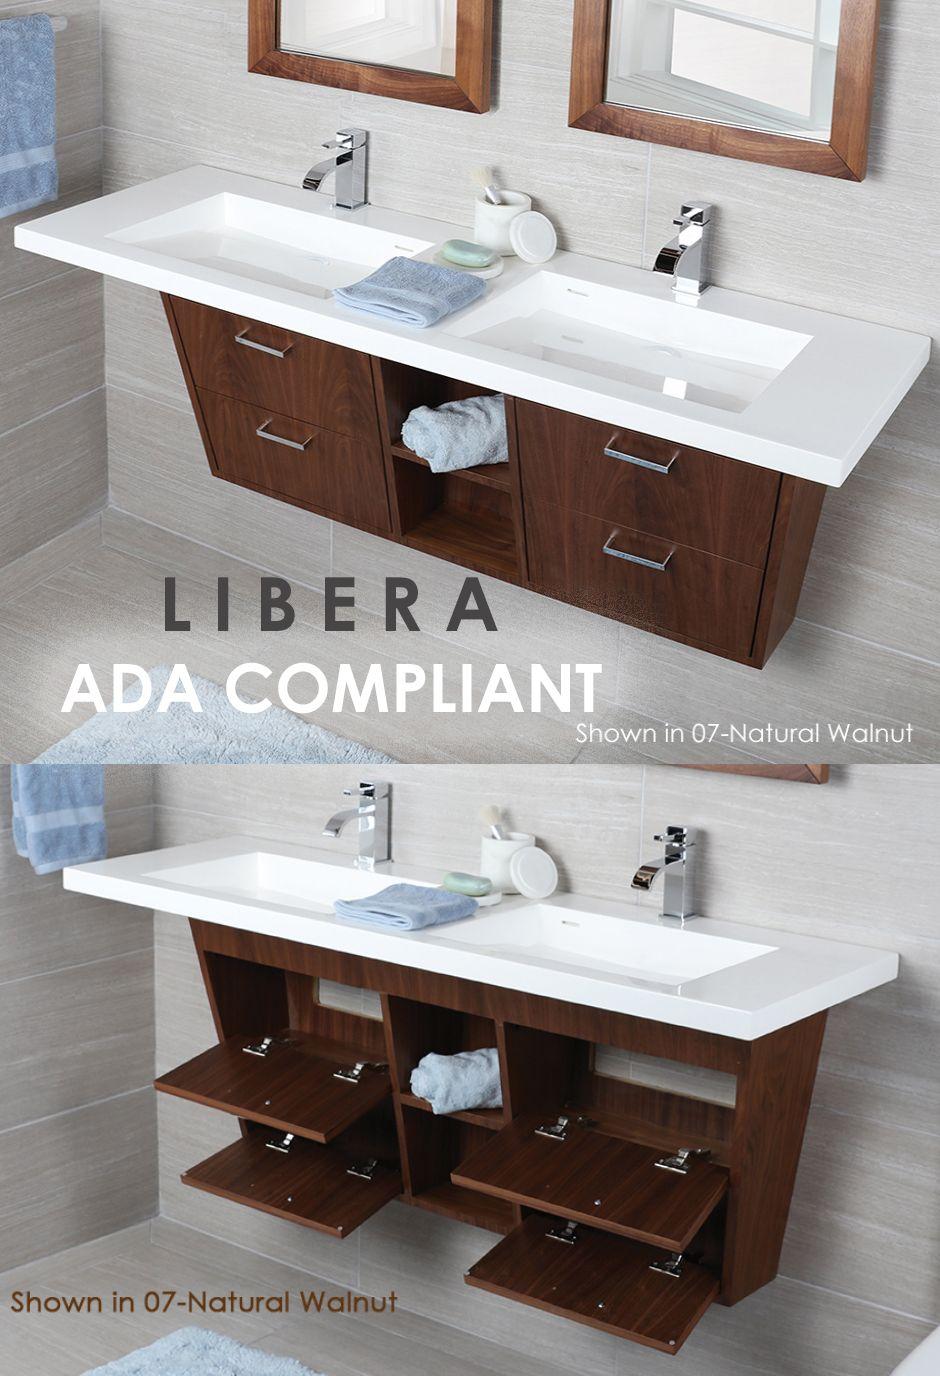 ada compliant vanity accessible